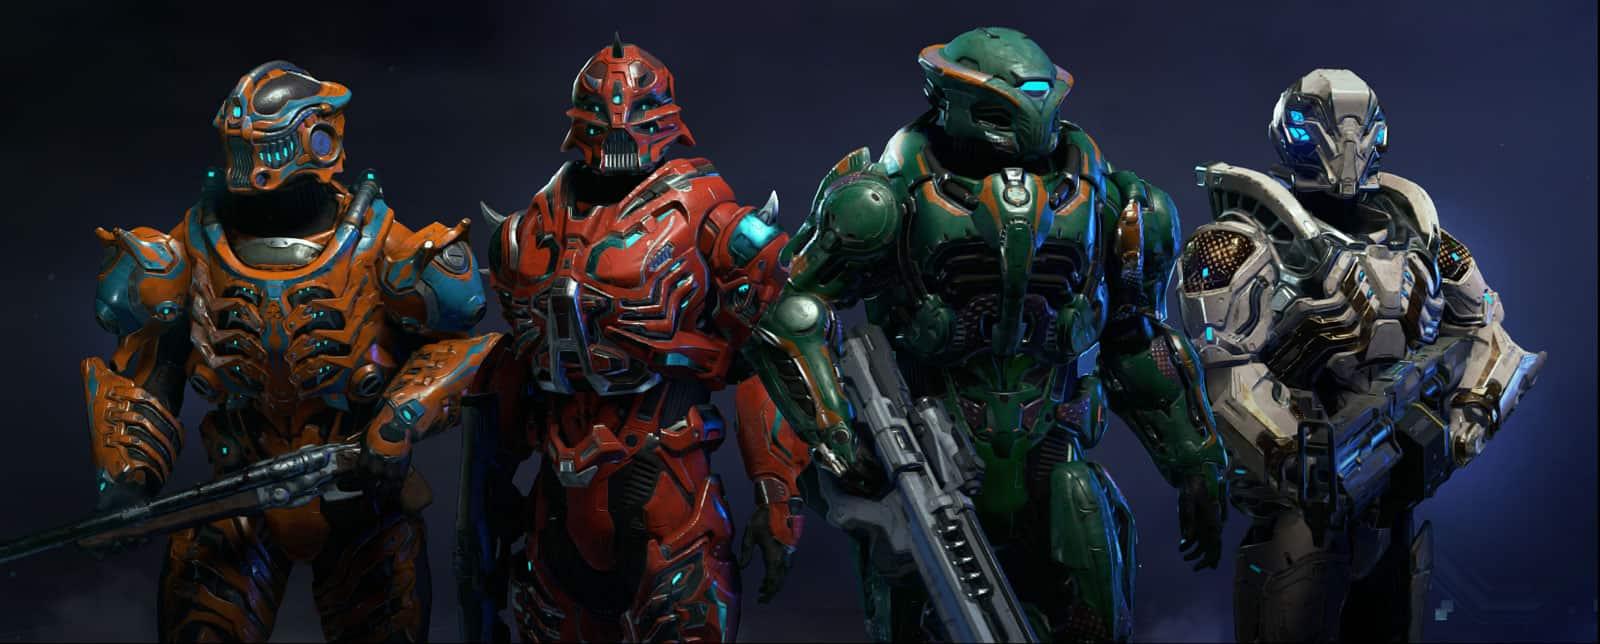 New DLC for Doom, Unto the Evil, released